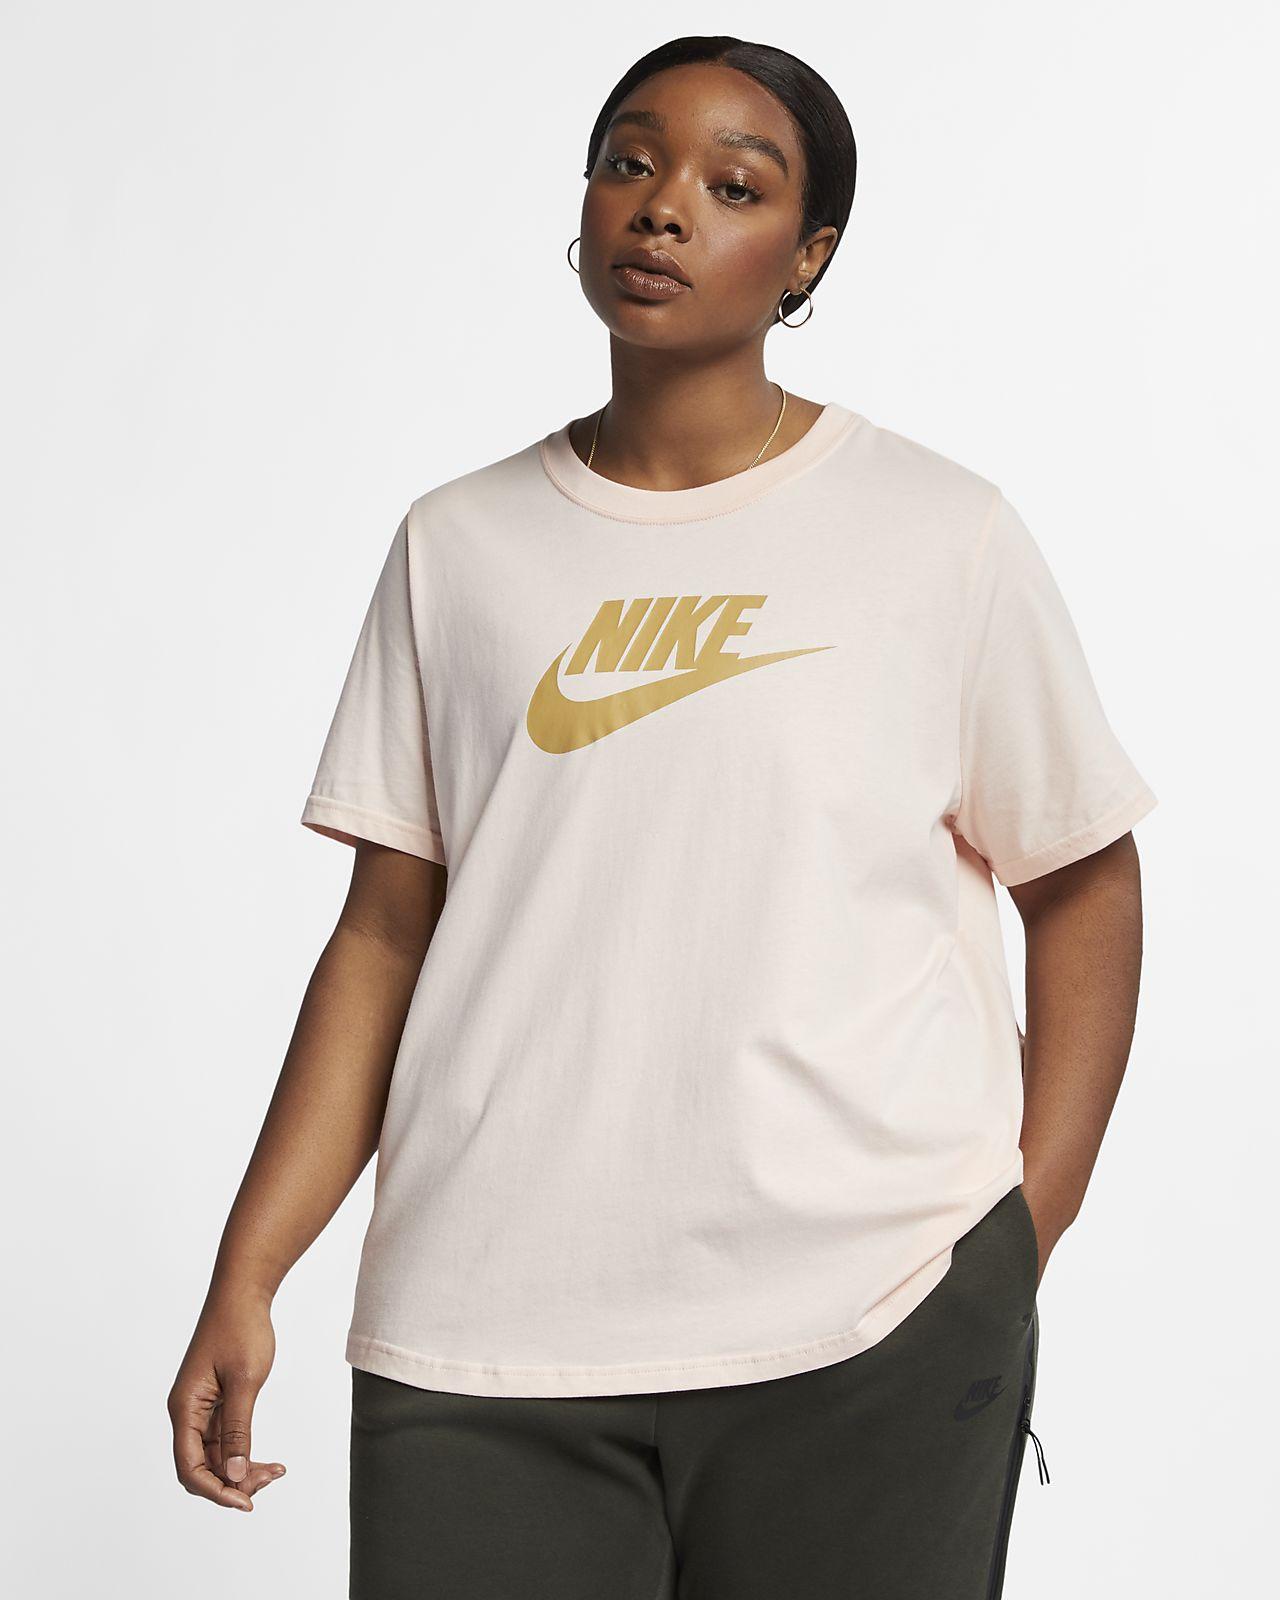 4d9ba900be6cc Nike Sportswear Essential Women s T-Shirt (Plus Size). Nike.com